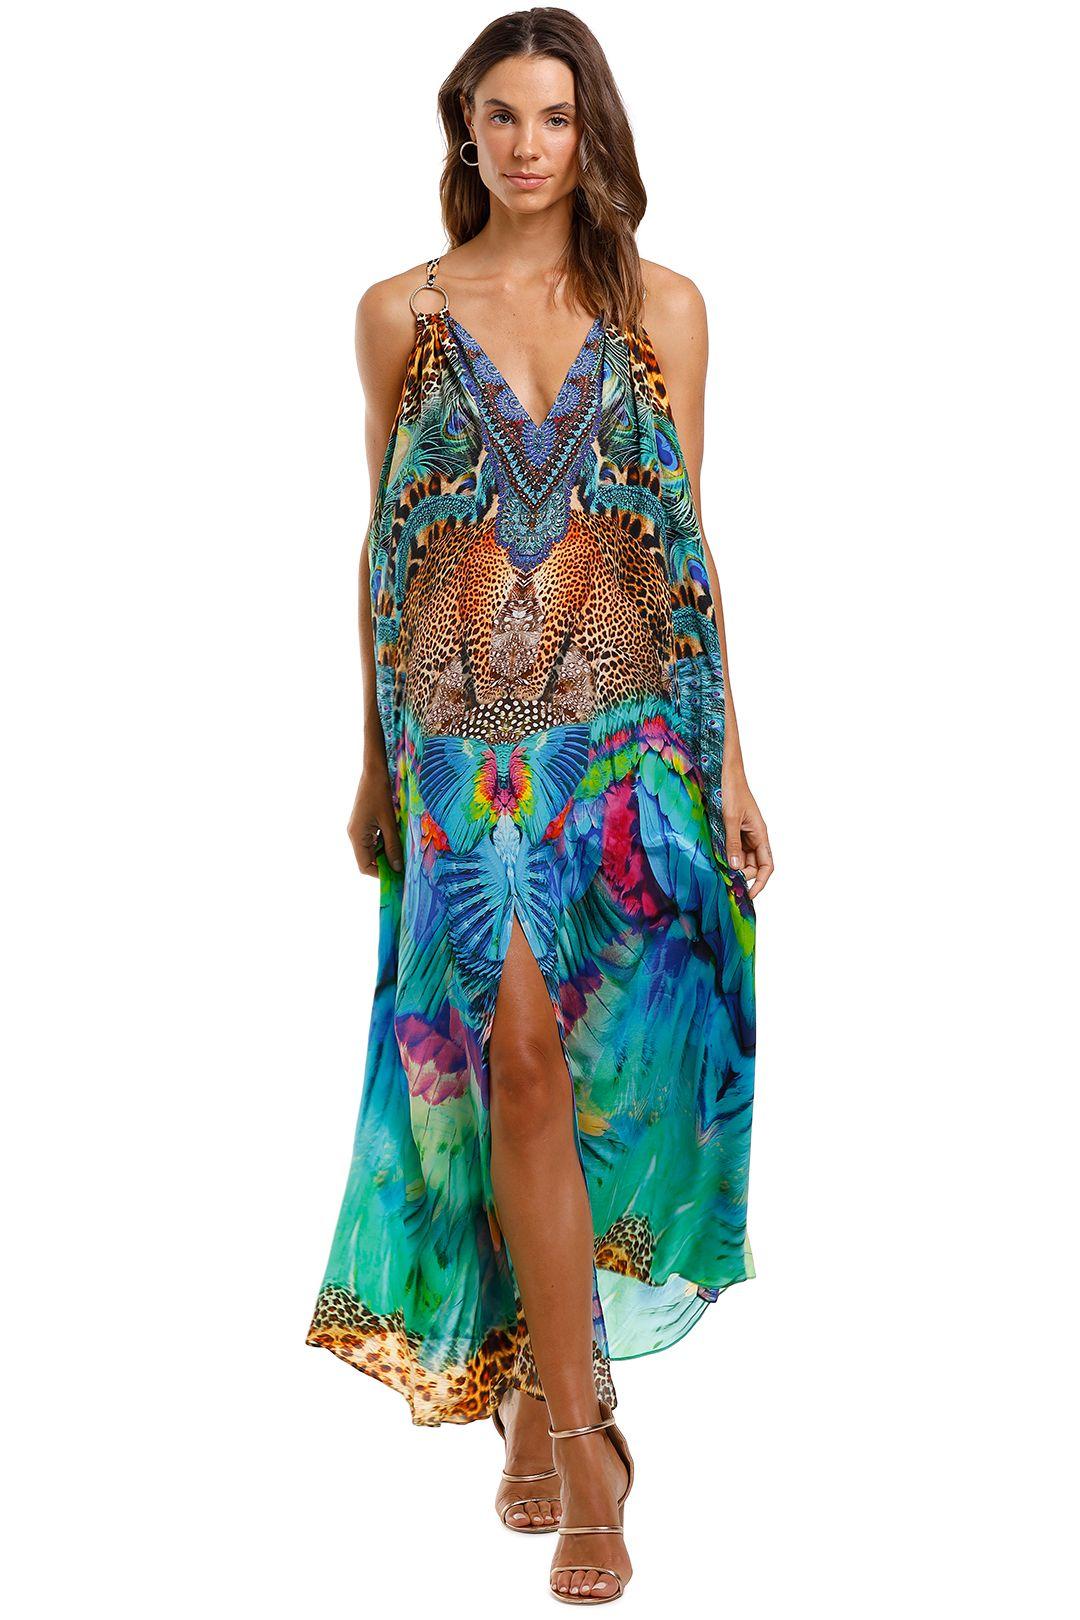 Camilla Ring Detail Strap Dress Maxi Sleeveless Kaftan